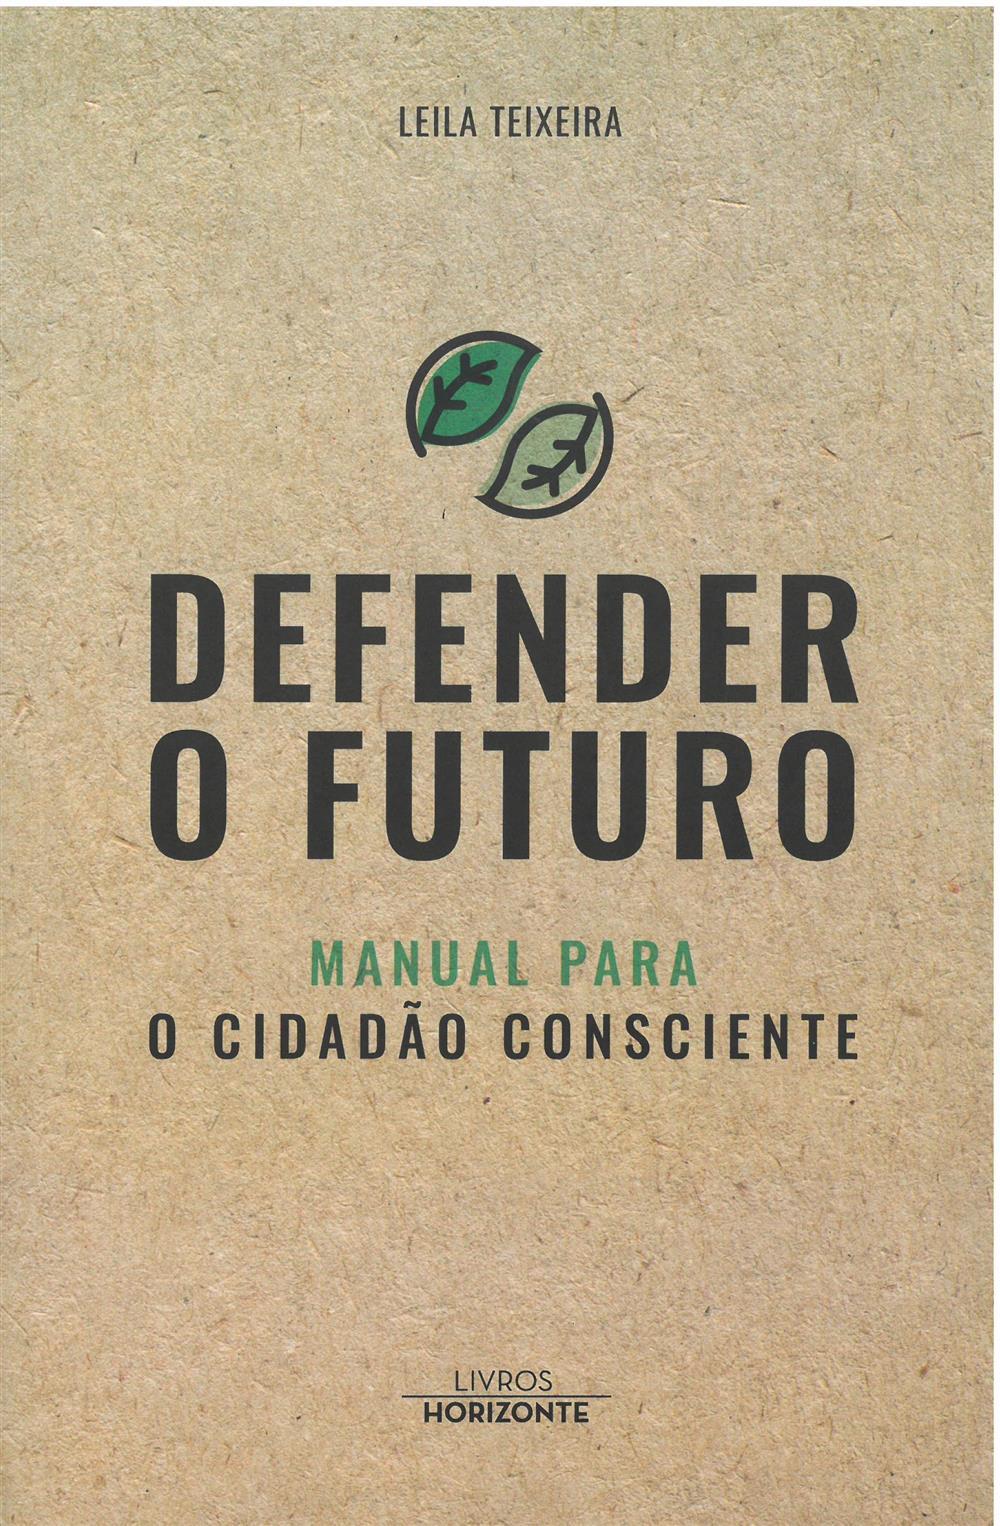 Defender o futuro.jpg